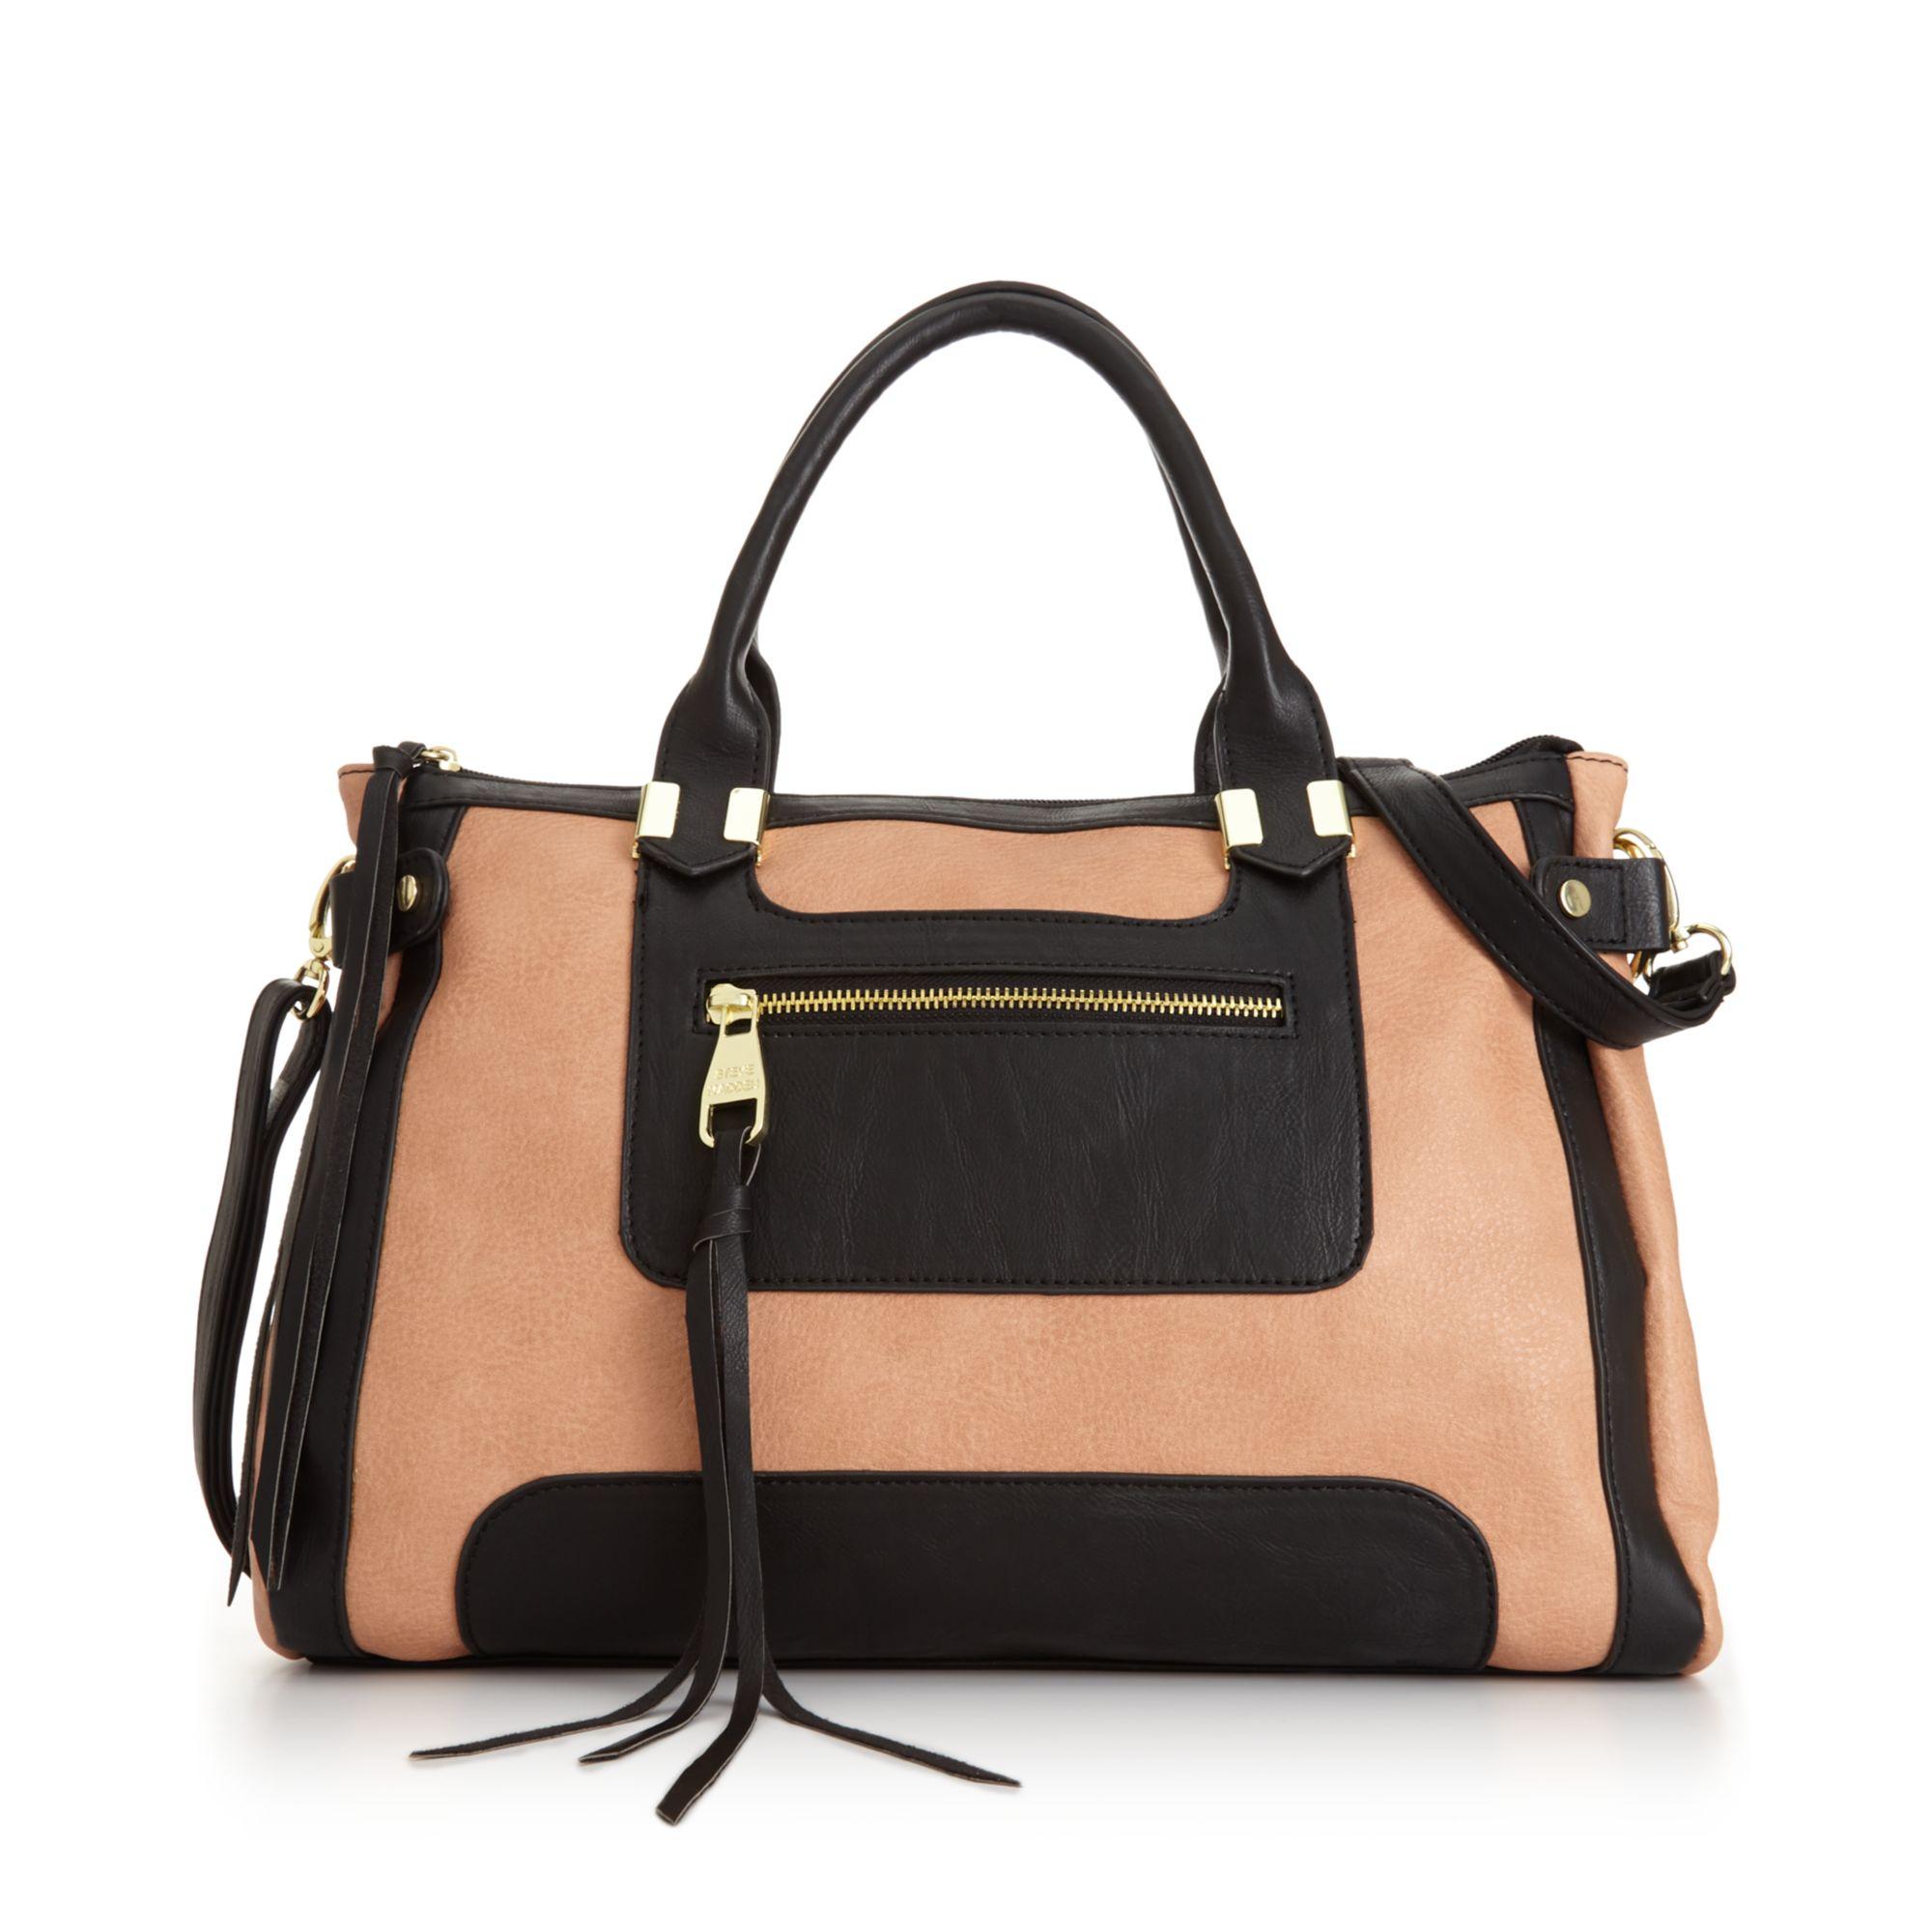 1126b183fc8d Lyst - Steve Madden Bag in Pink